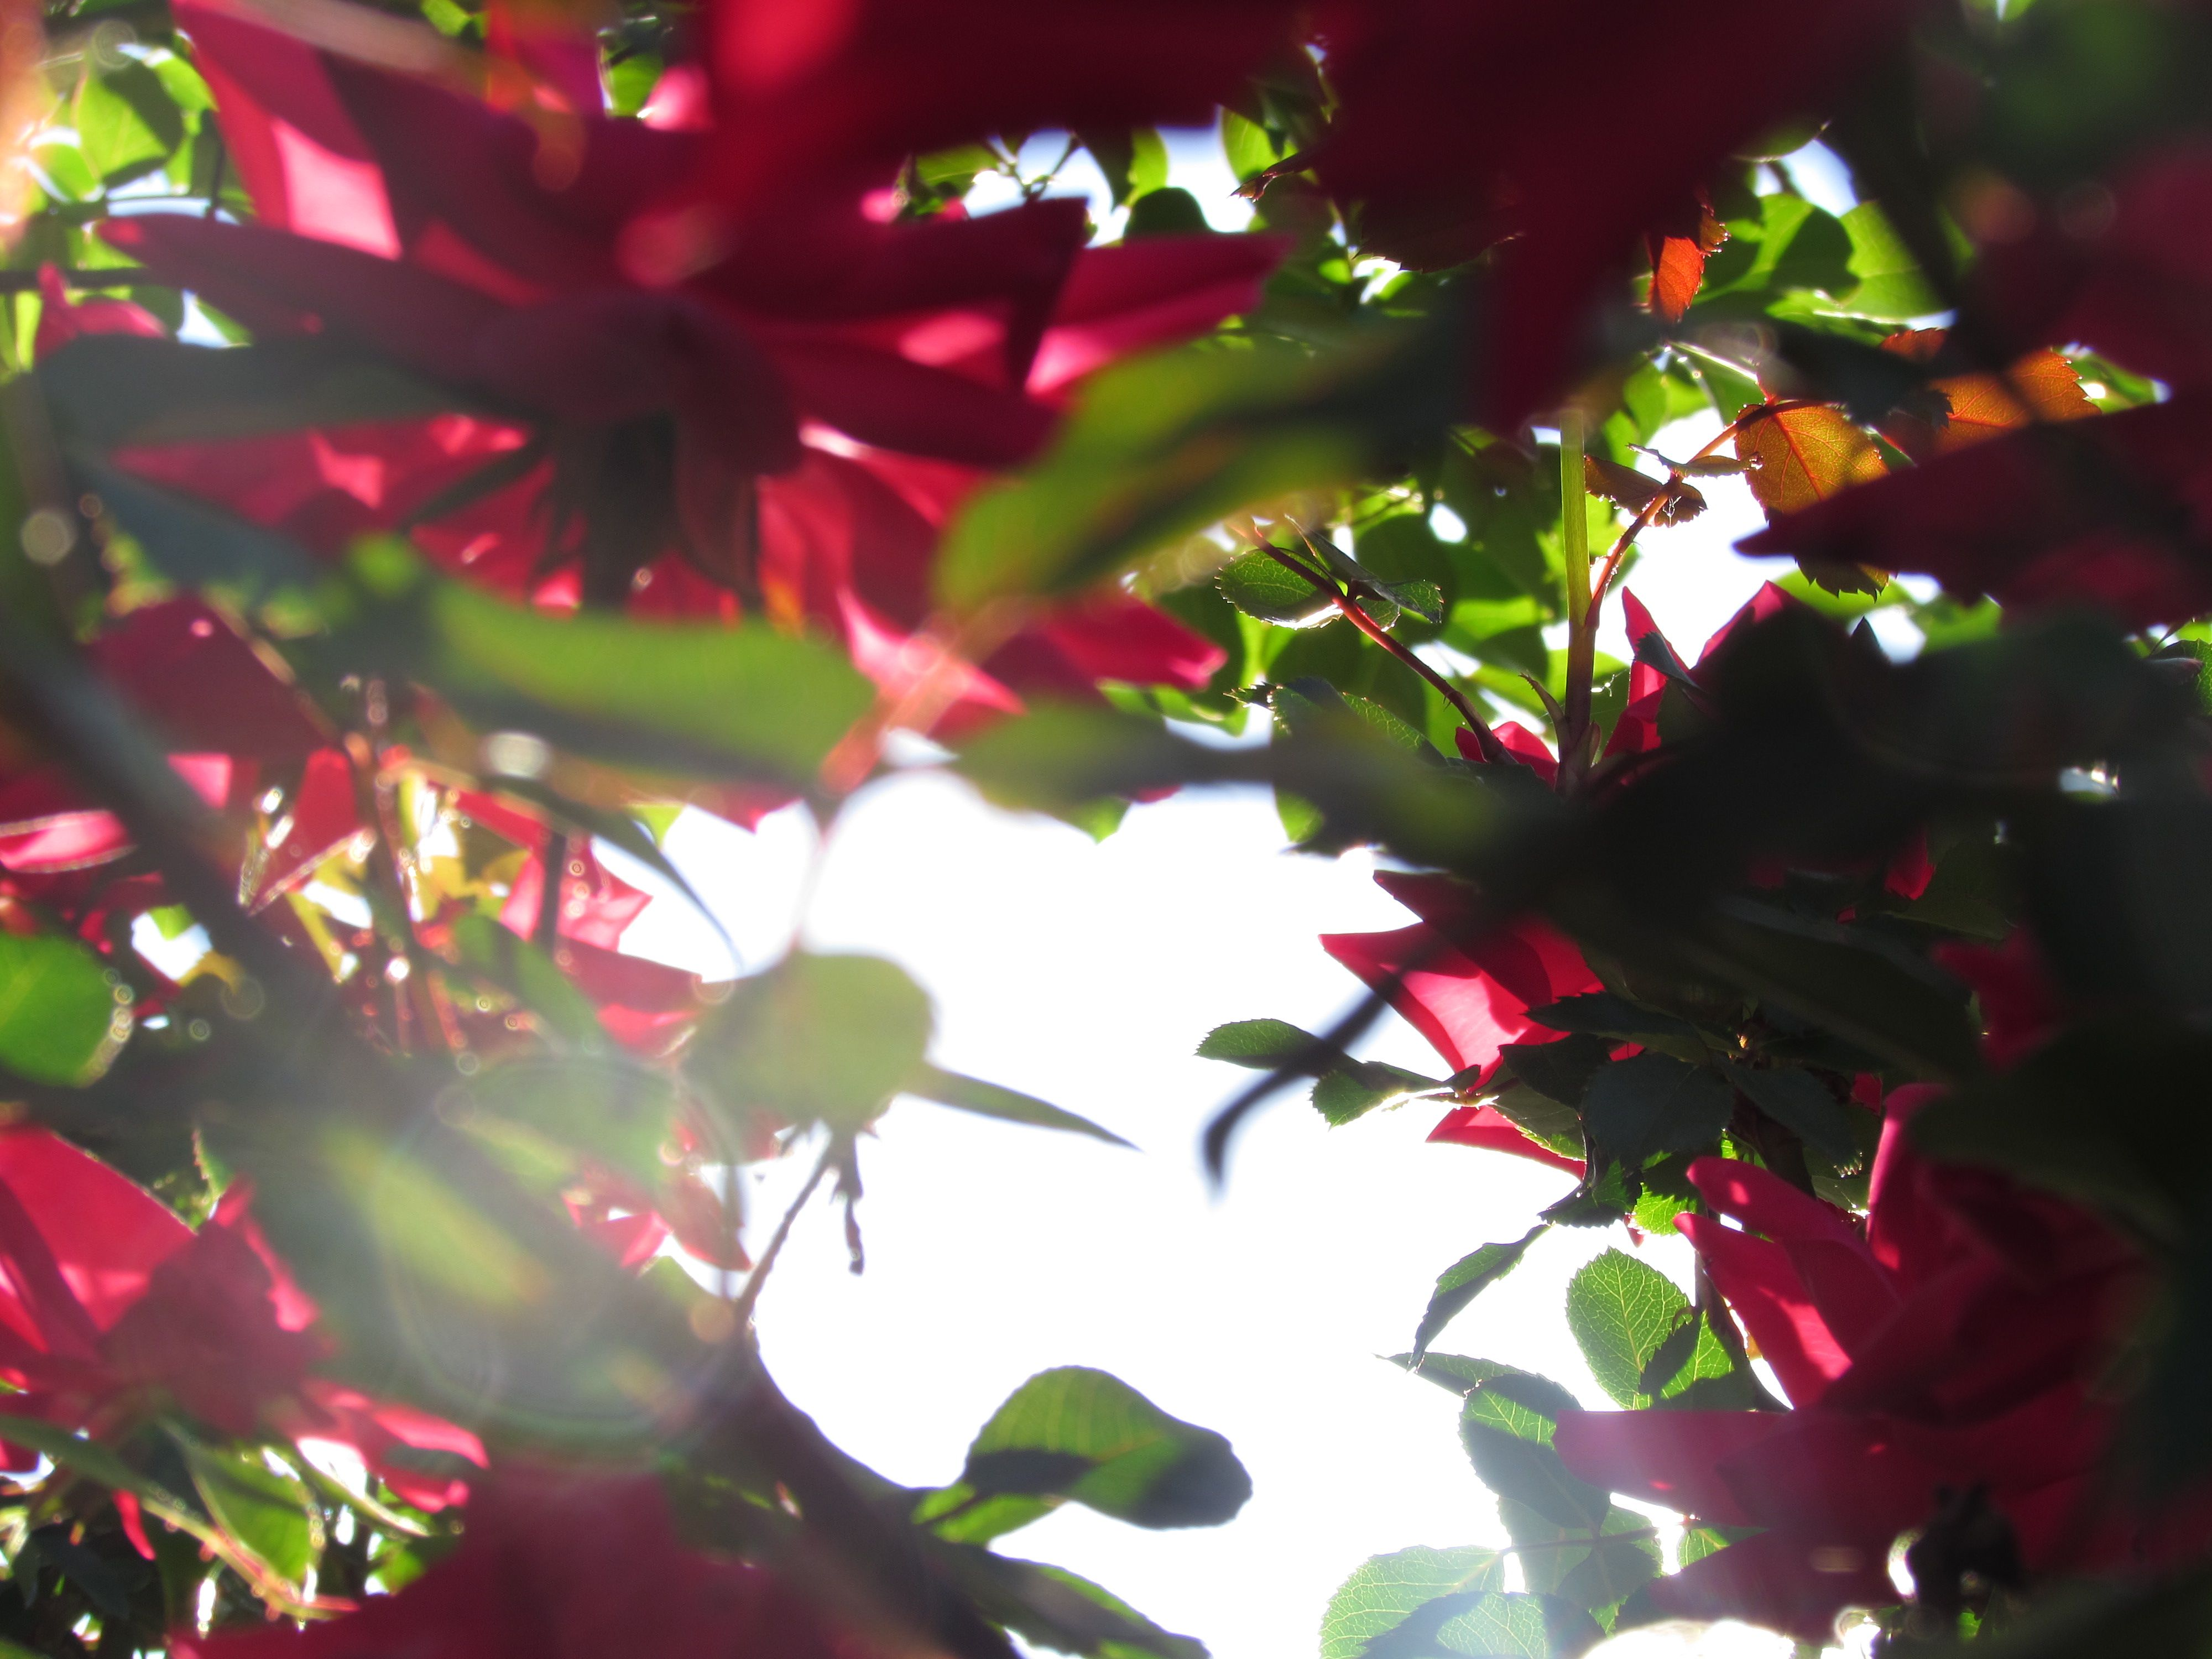 picture of sunlight through a rose bush Rose bush